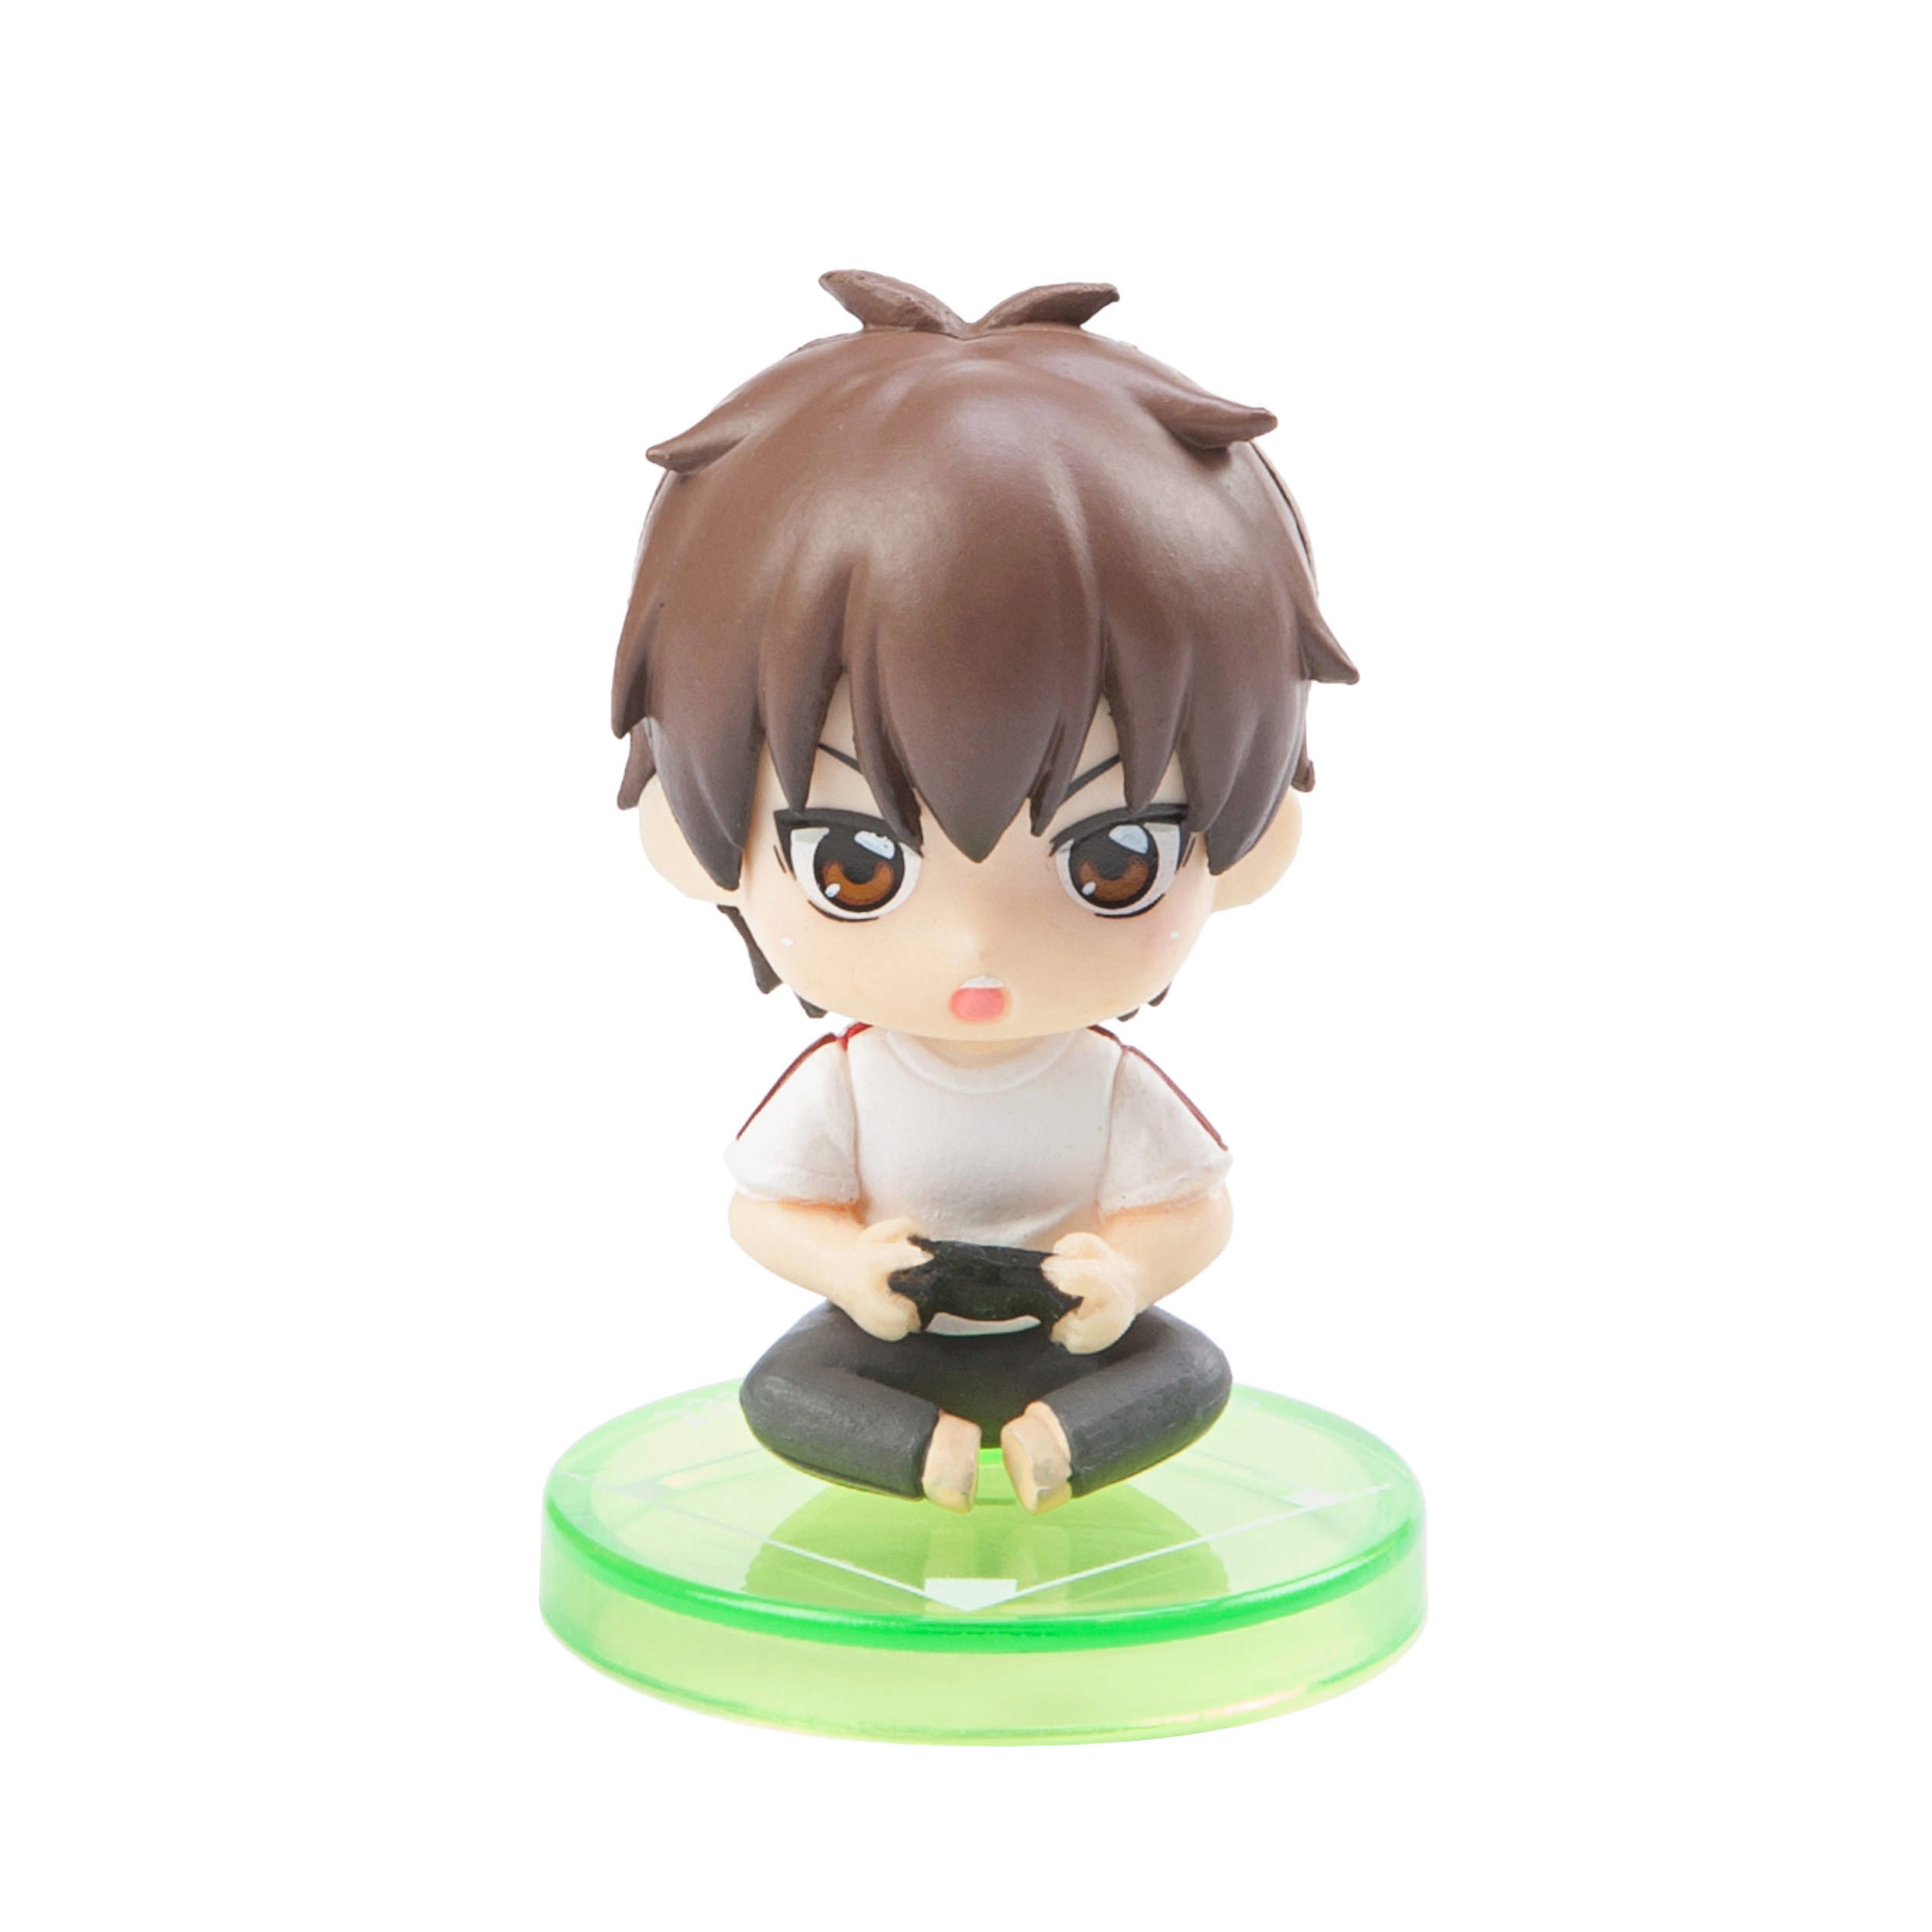 Ace of Diamond Todoroki Raichi Chibi Mini Figure